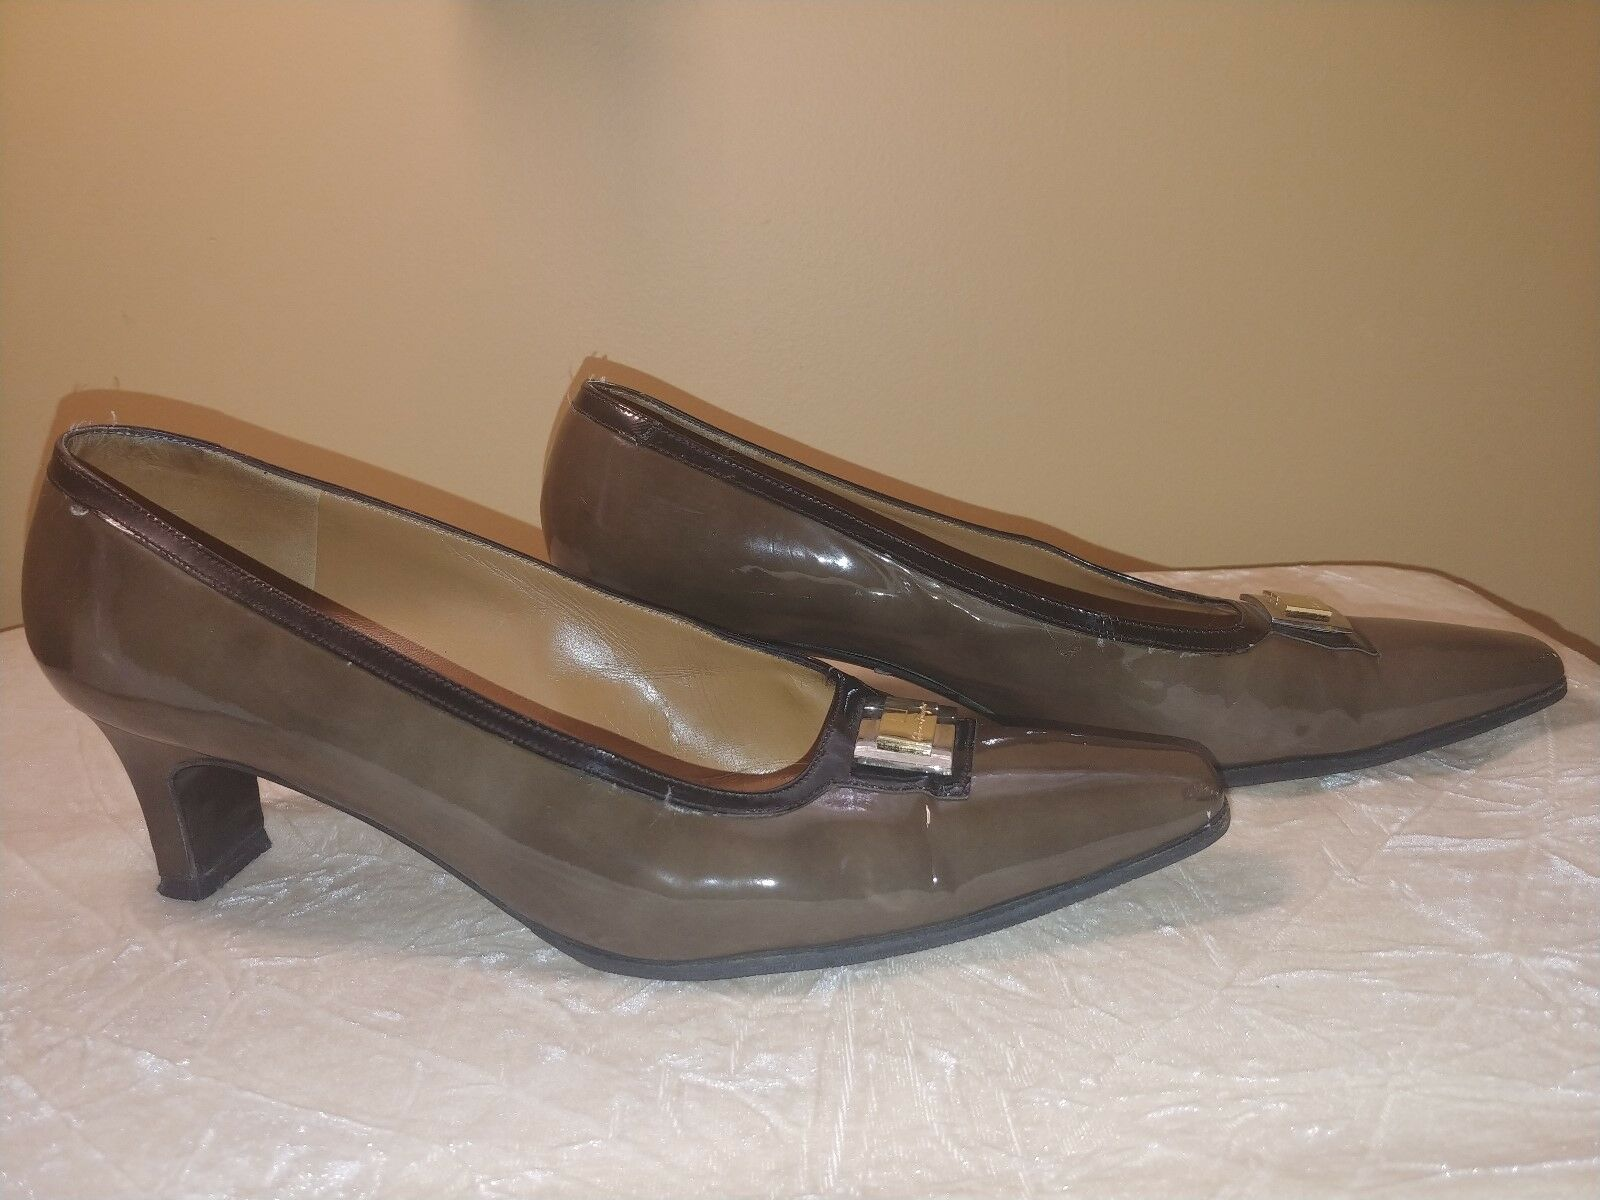 Ferragamo damen Heels Heels Heels Pumps Slip Ons  Patent Leather Olive Grün braun 10 bc8643